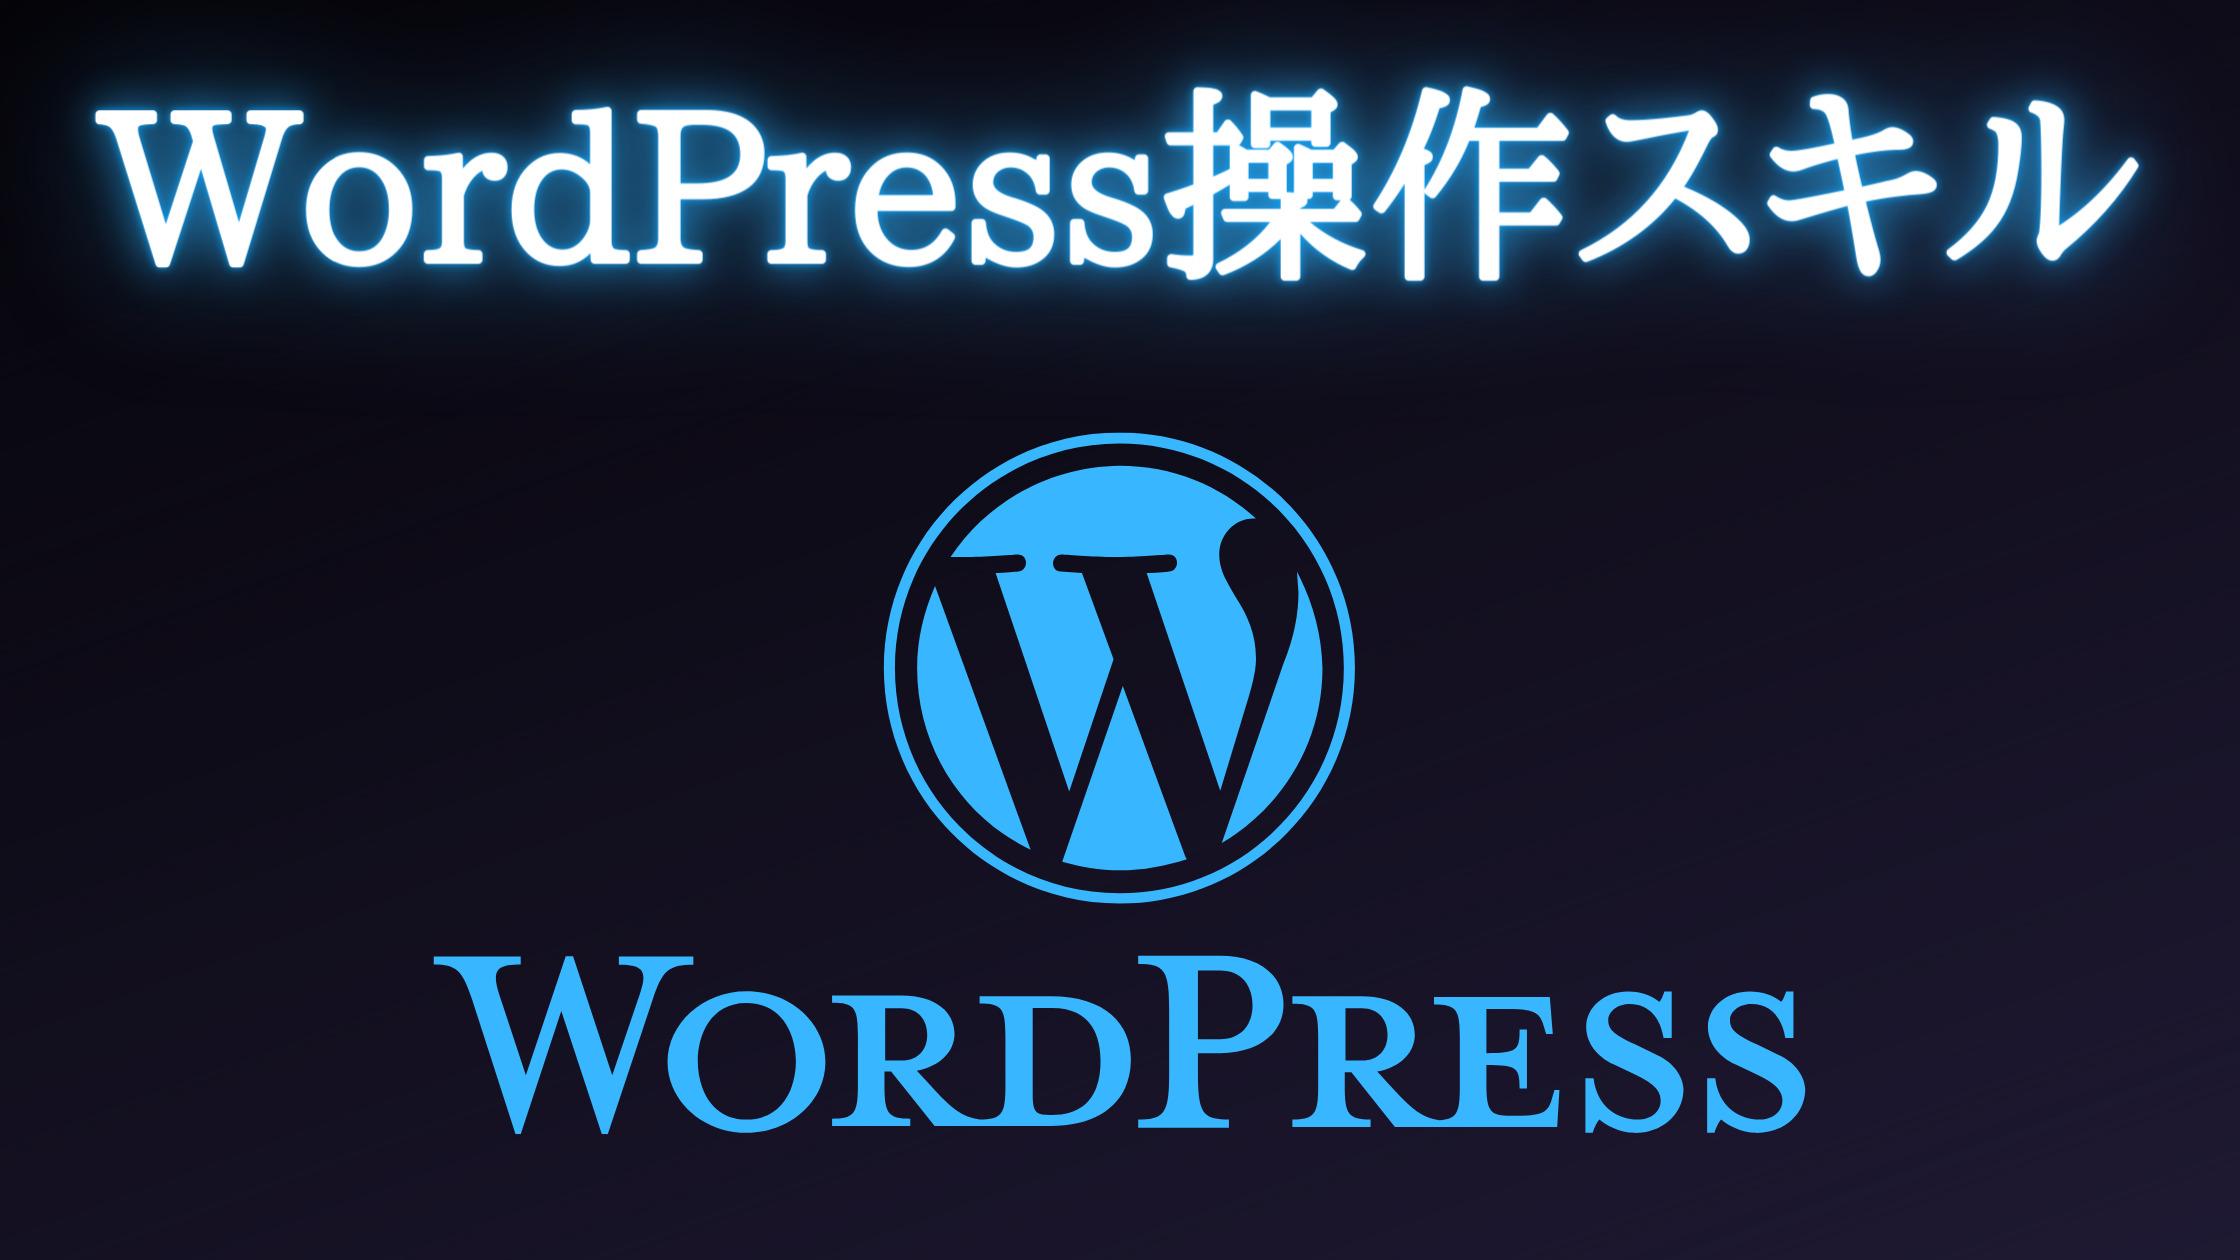 WordPressスキル